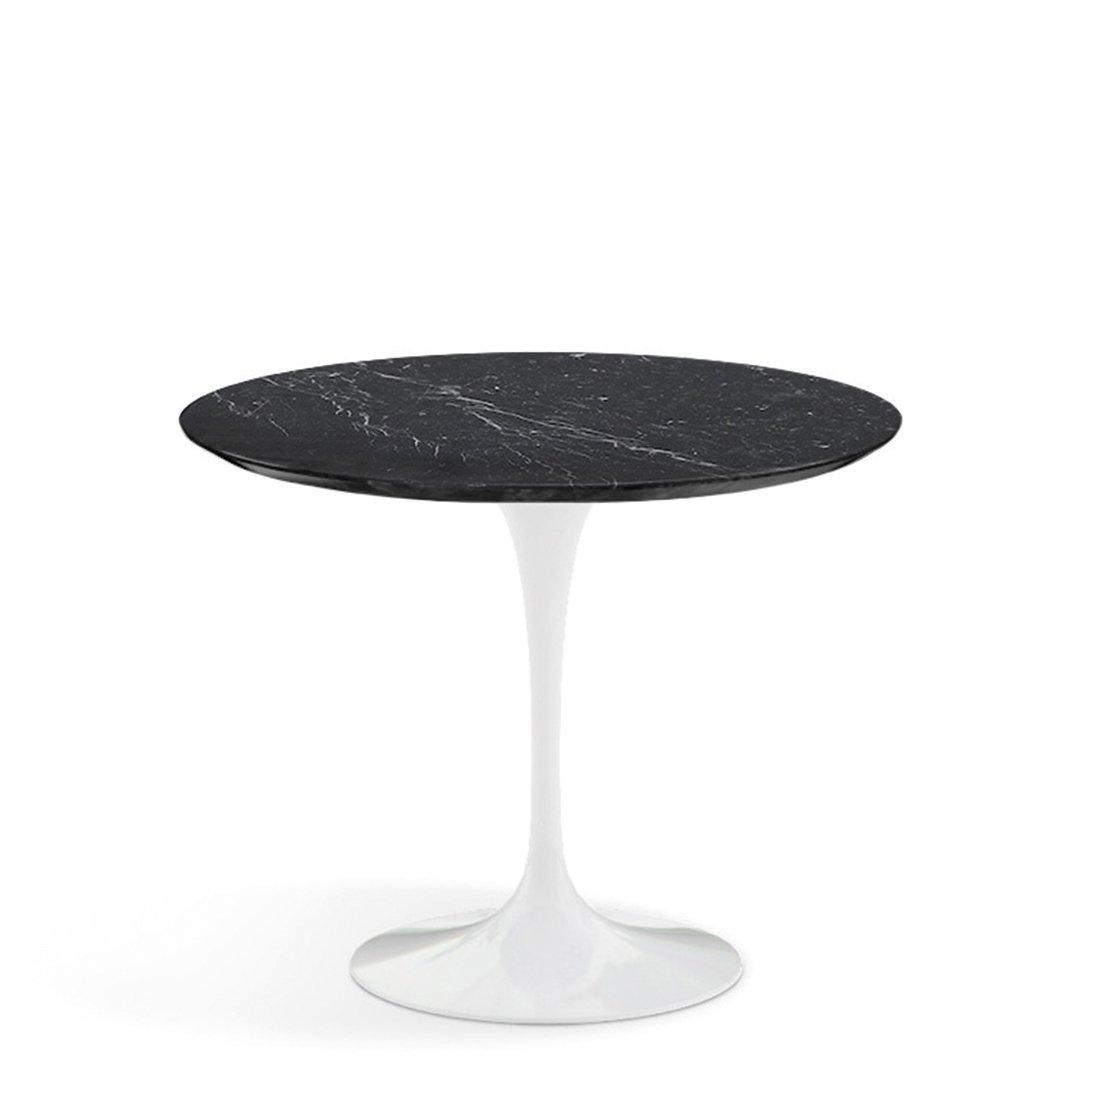 Knoll Studio Saarinen Tulip Eettafel 91 cm. - Nero Marquina